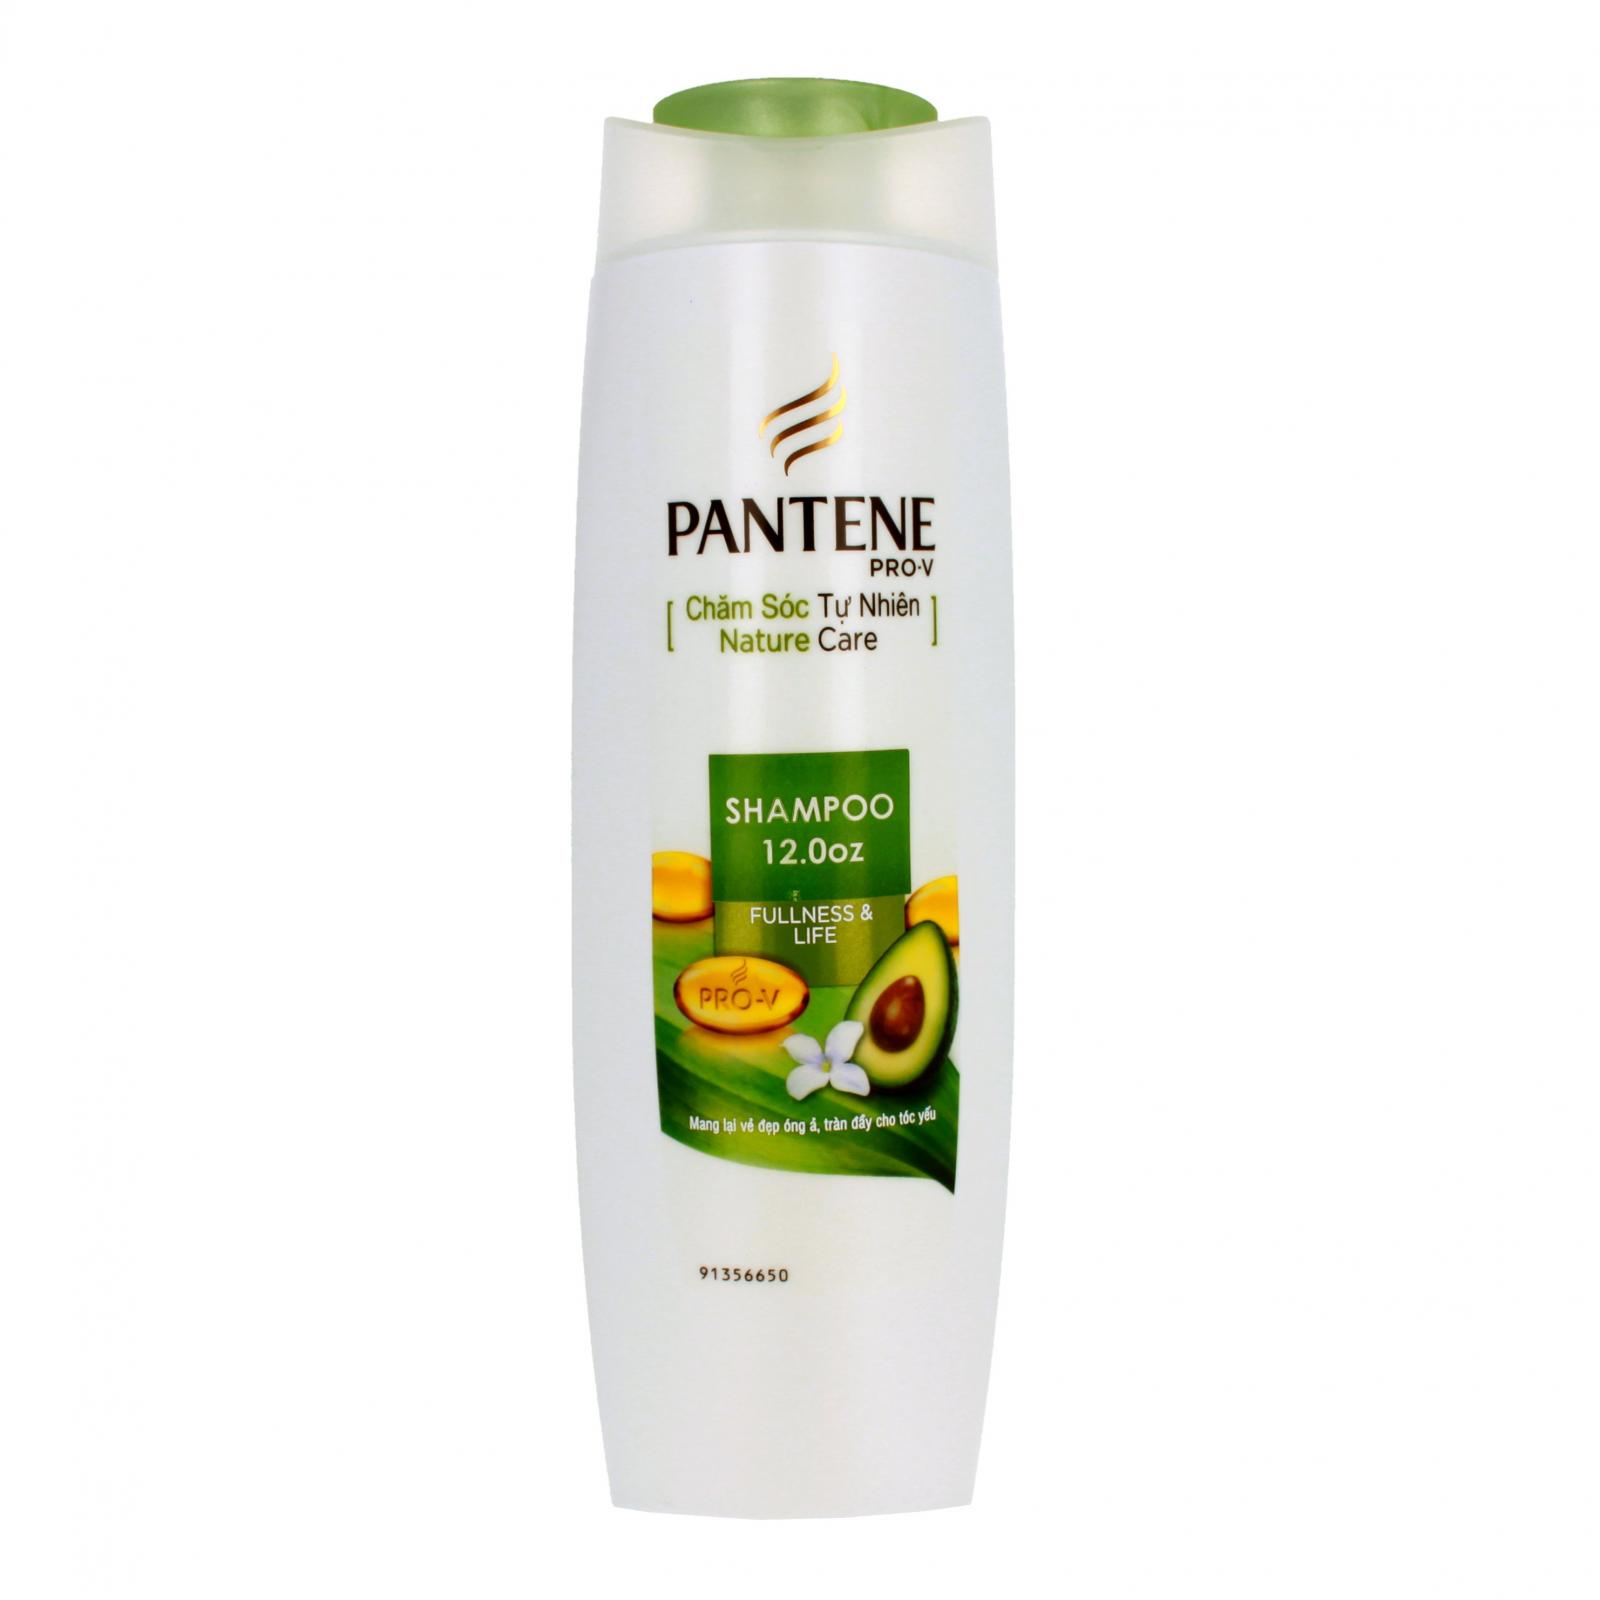 Pantene Pro-V Fullness and Life Womens Shampoo 12oz Bottle